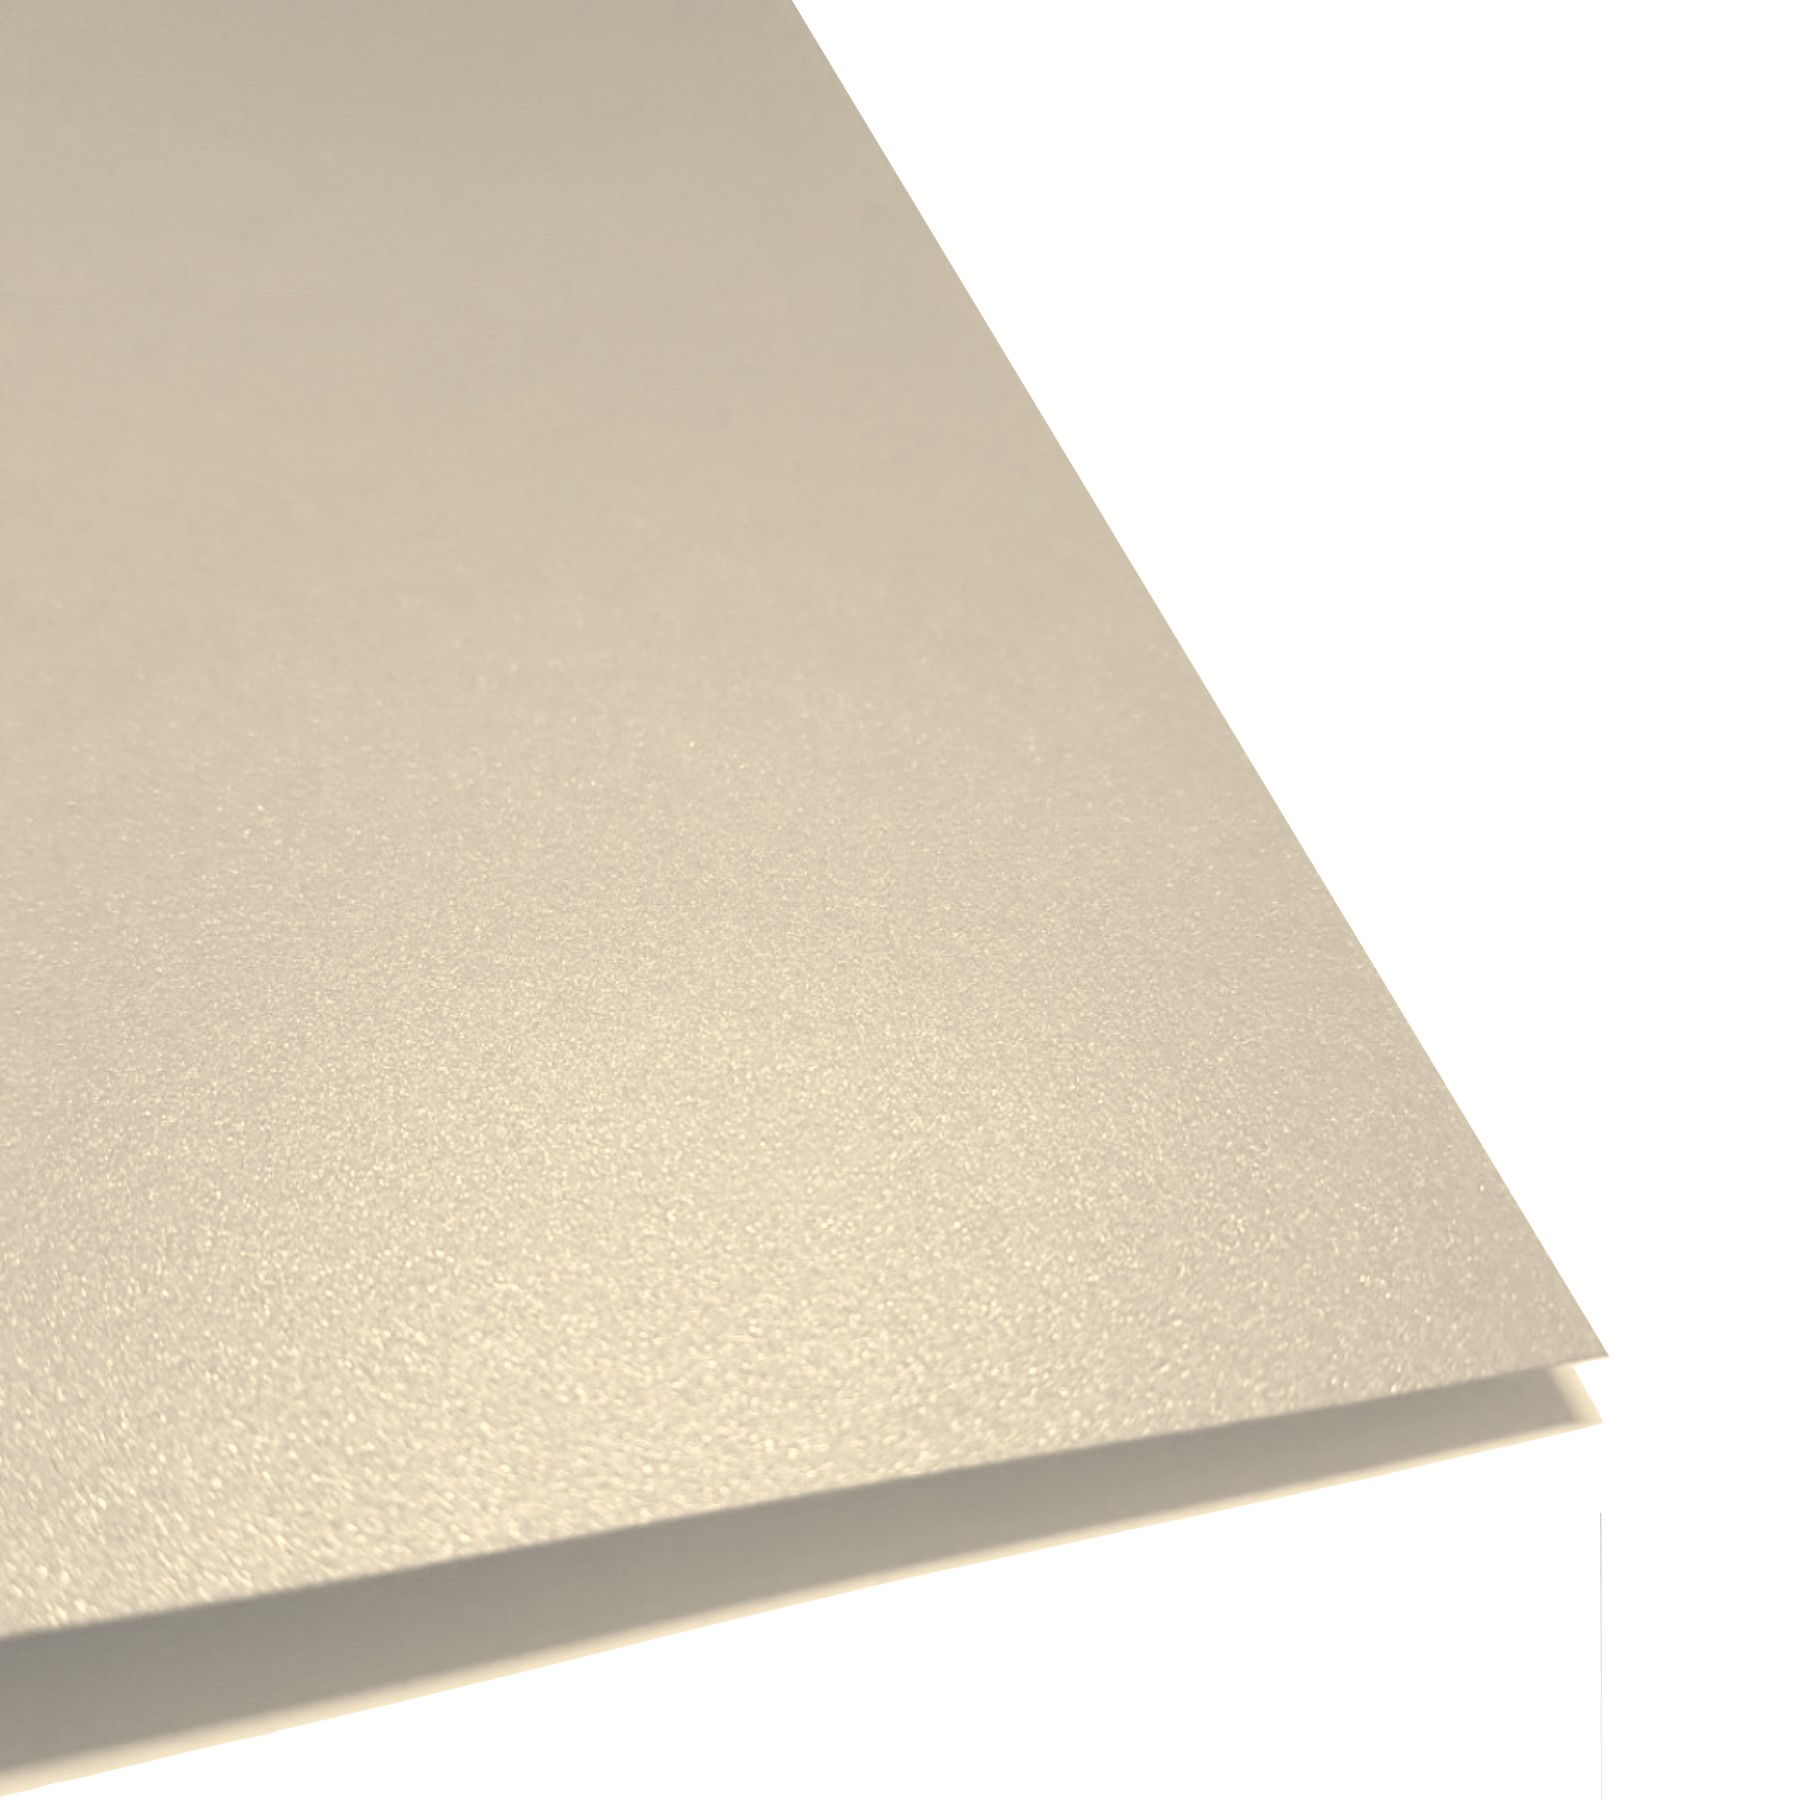 Cartulina perlescente plata 20 hojas carta